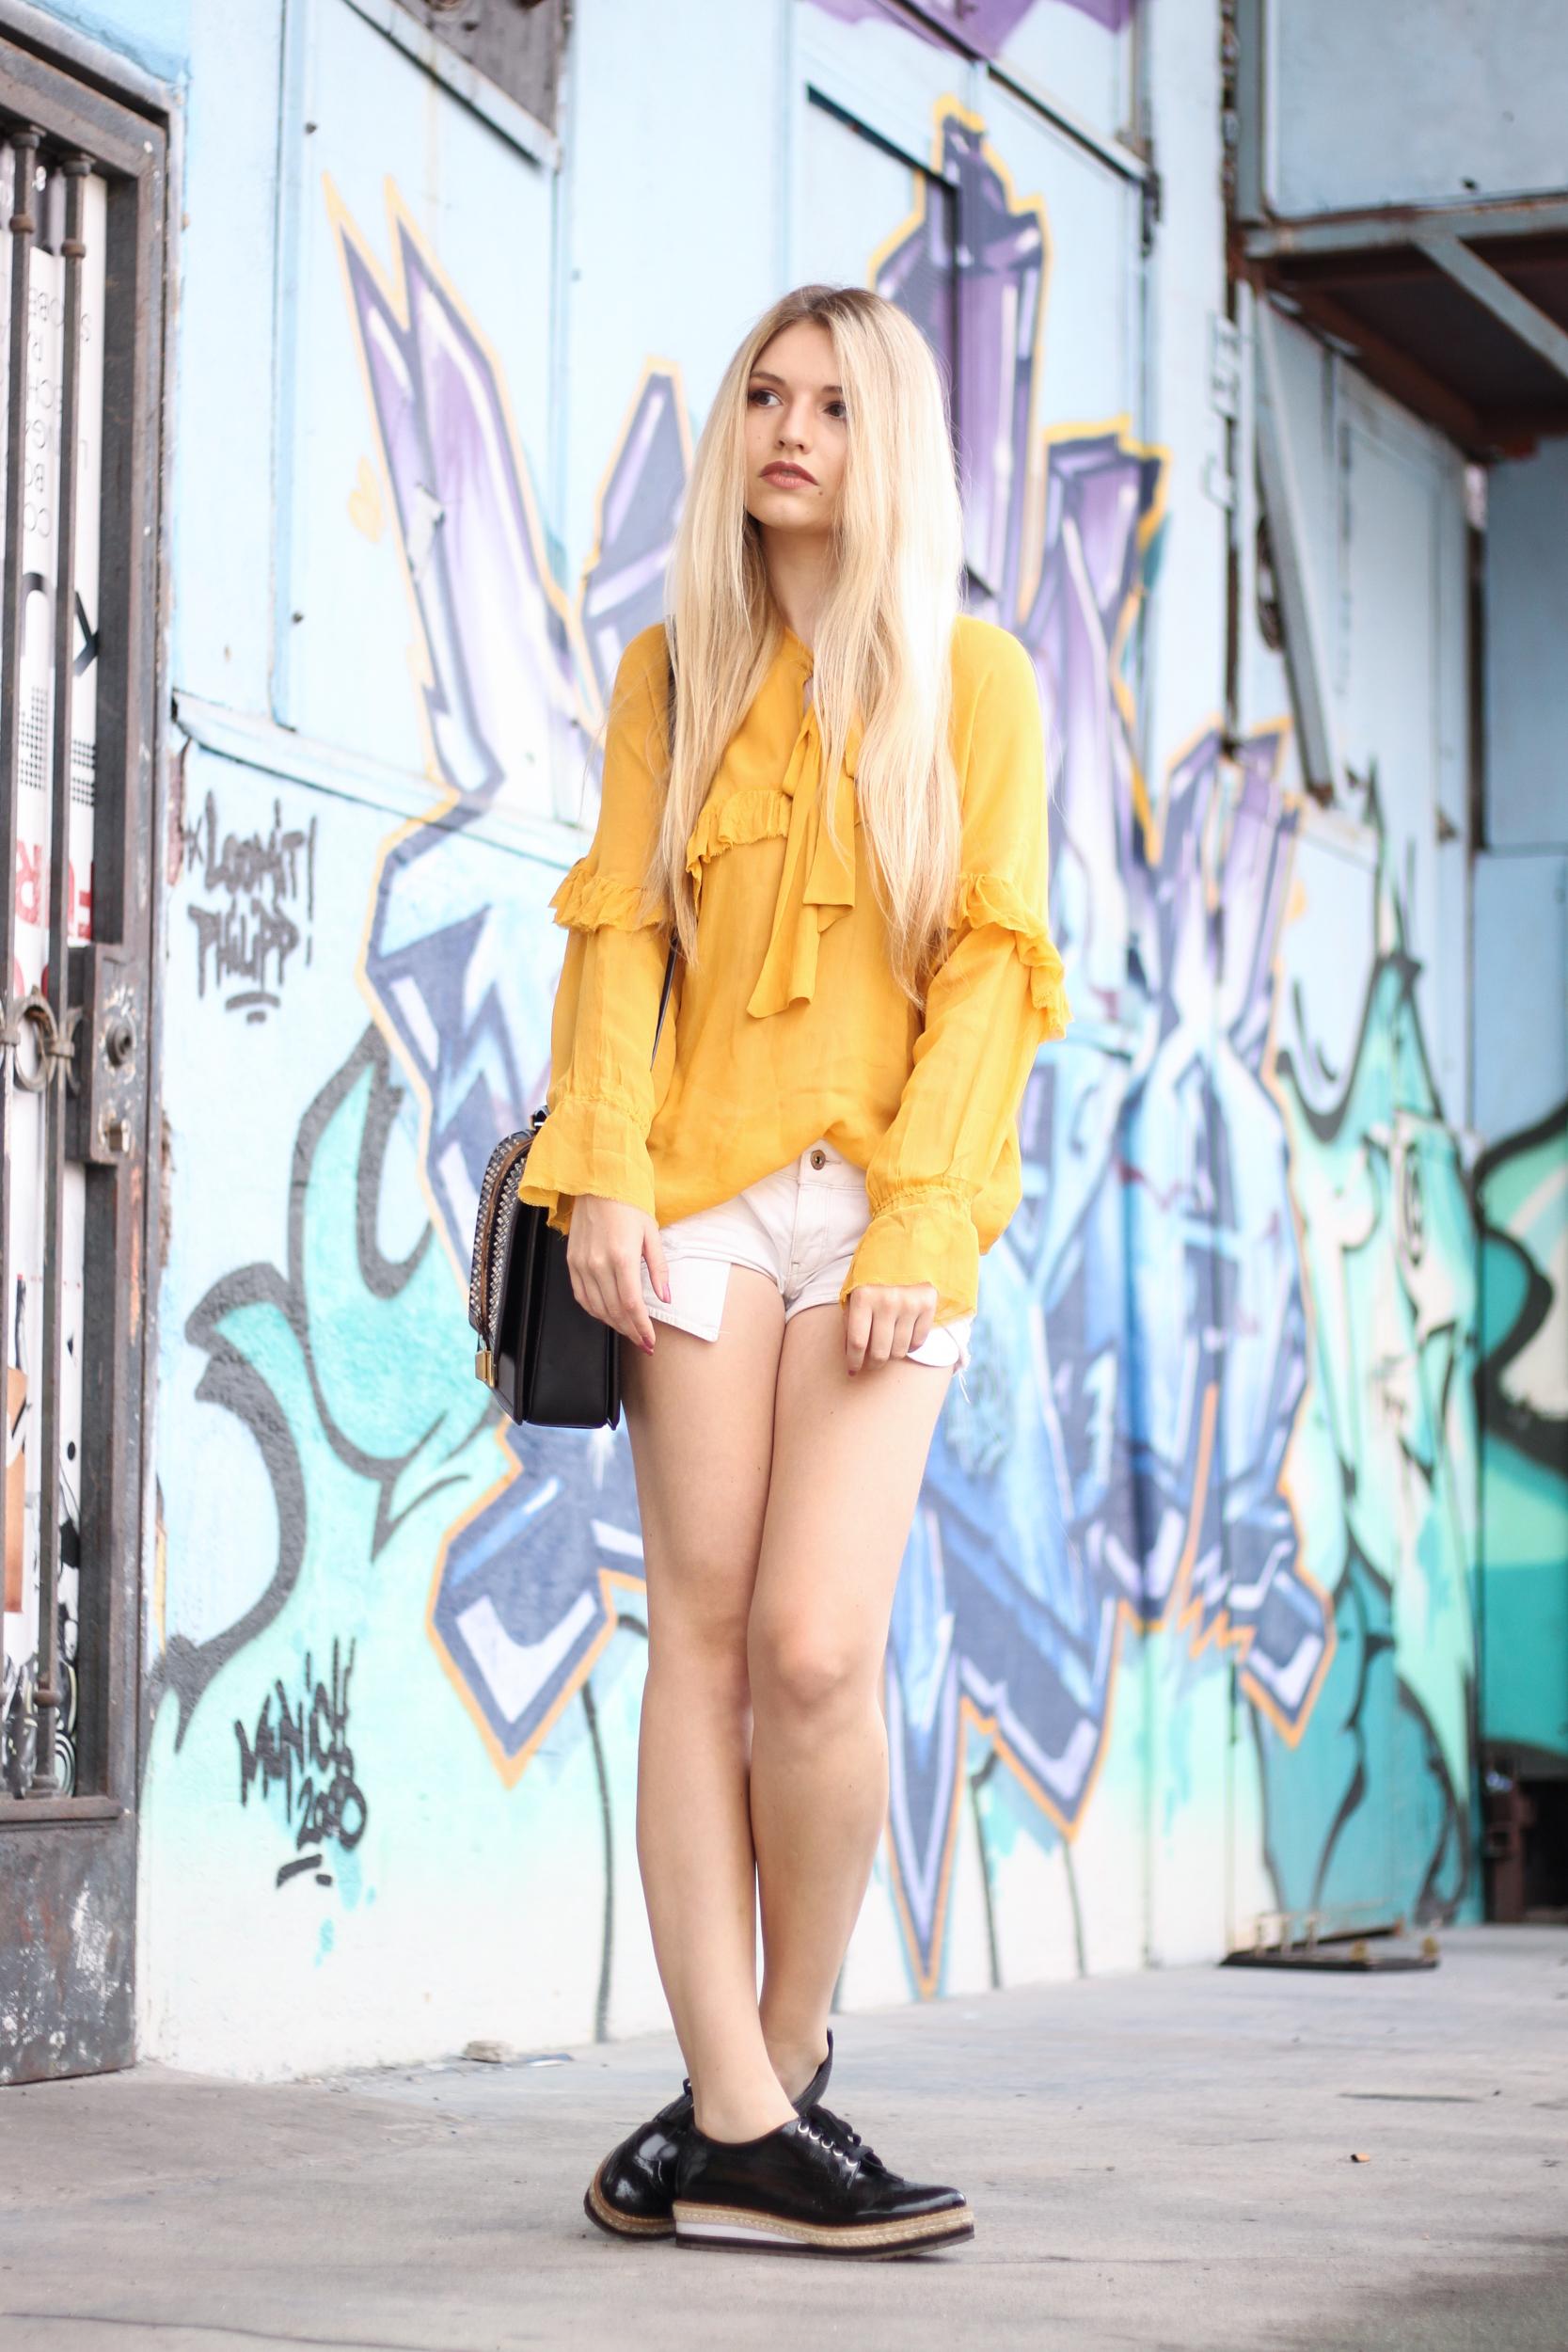 franziska-elea-blogger-aus-muenchen-fashionblog-mode-blog-outfit-volants-bluse-zara-senfgeld-verdrehte-fuesse-umhaengetasche-doppelkinn-witzig